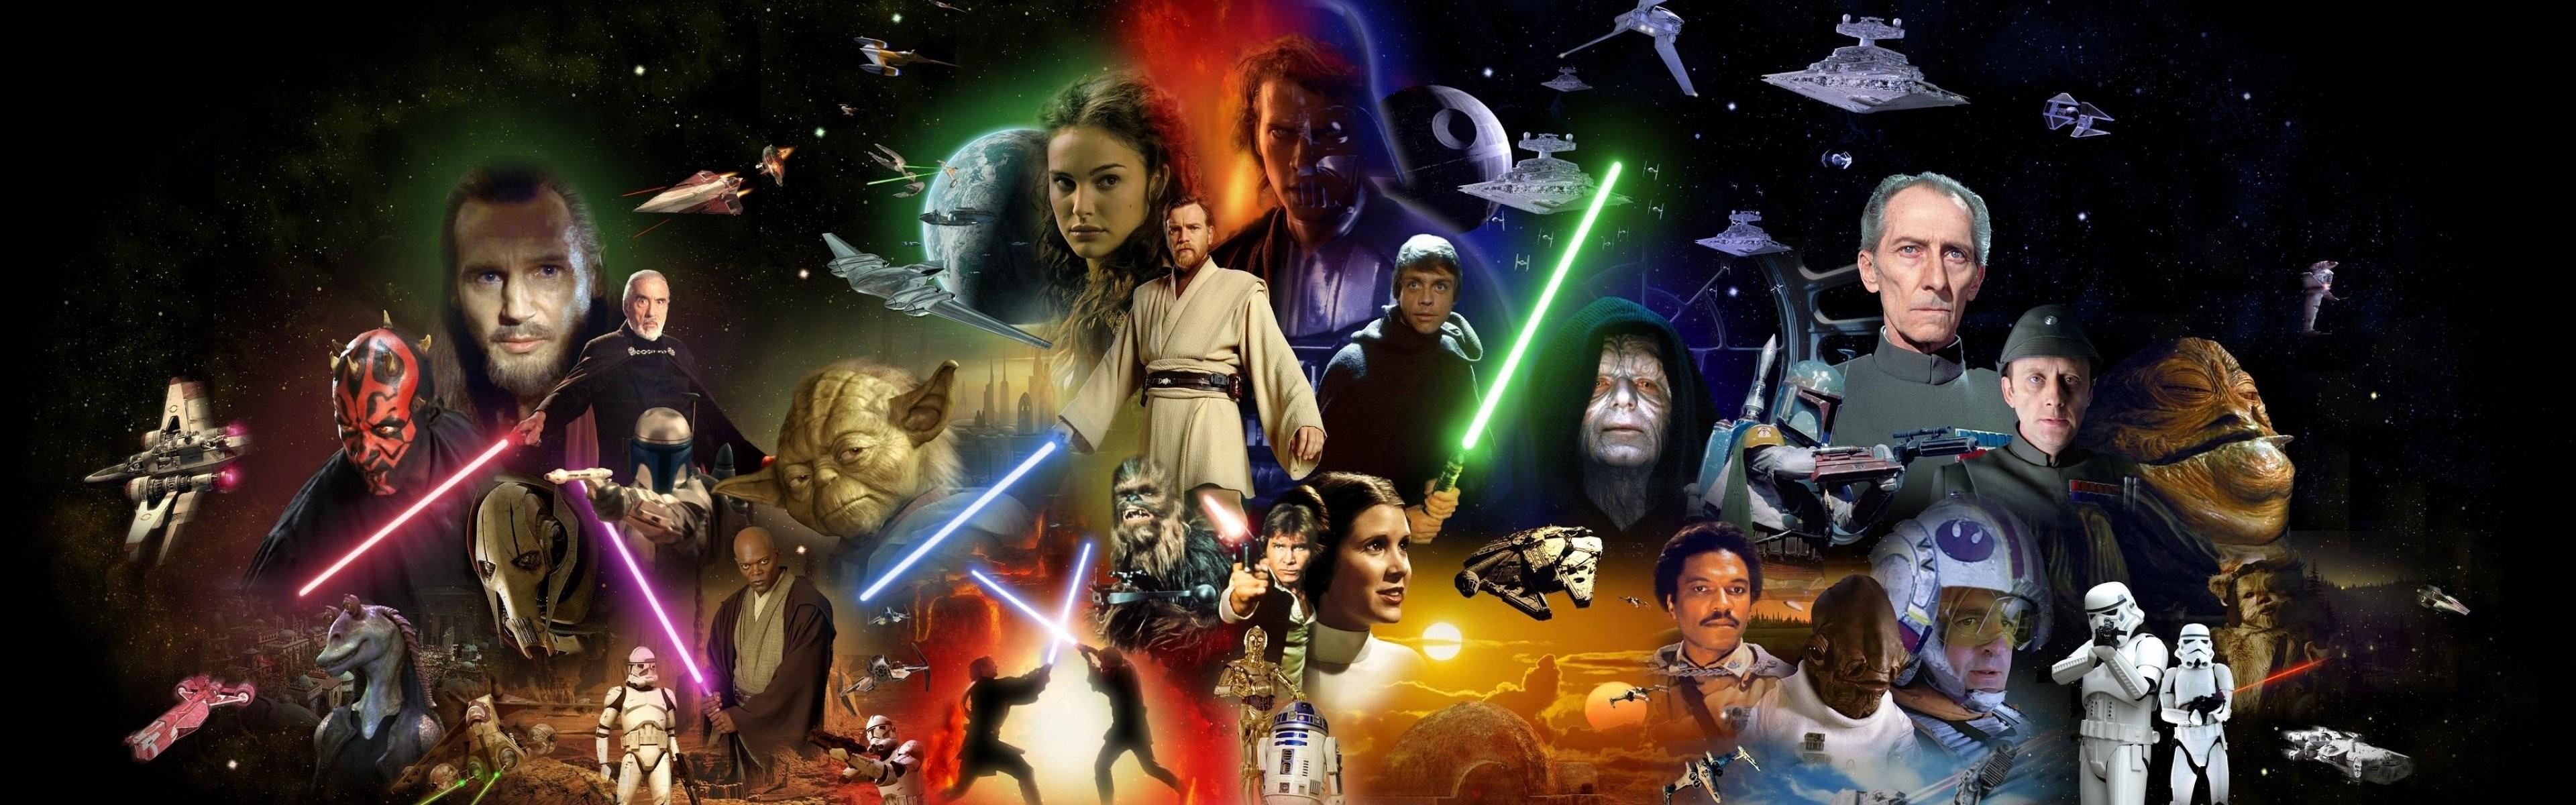 High Res Star Wars Wallpaper | Epic Car Wallpapers | Pinterest | Star wars  wallpaper and Wallpaper